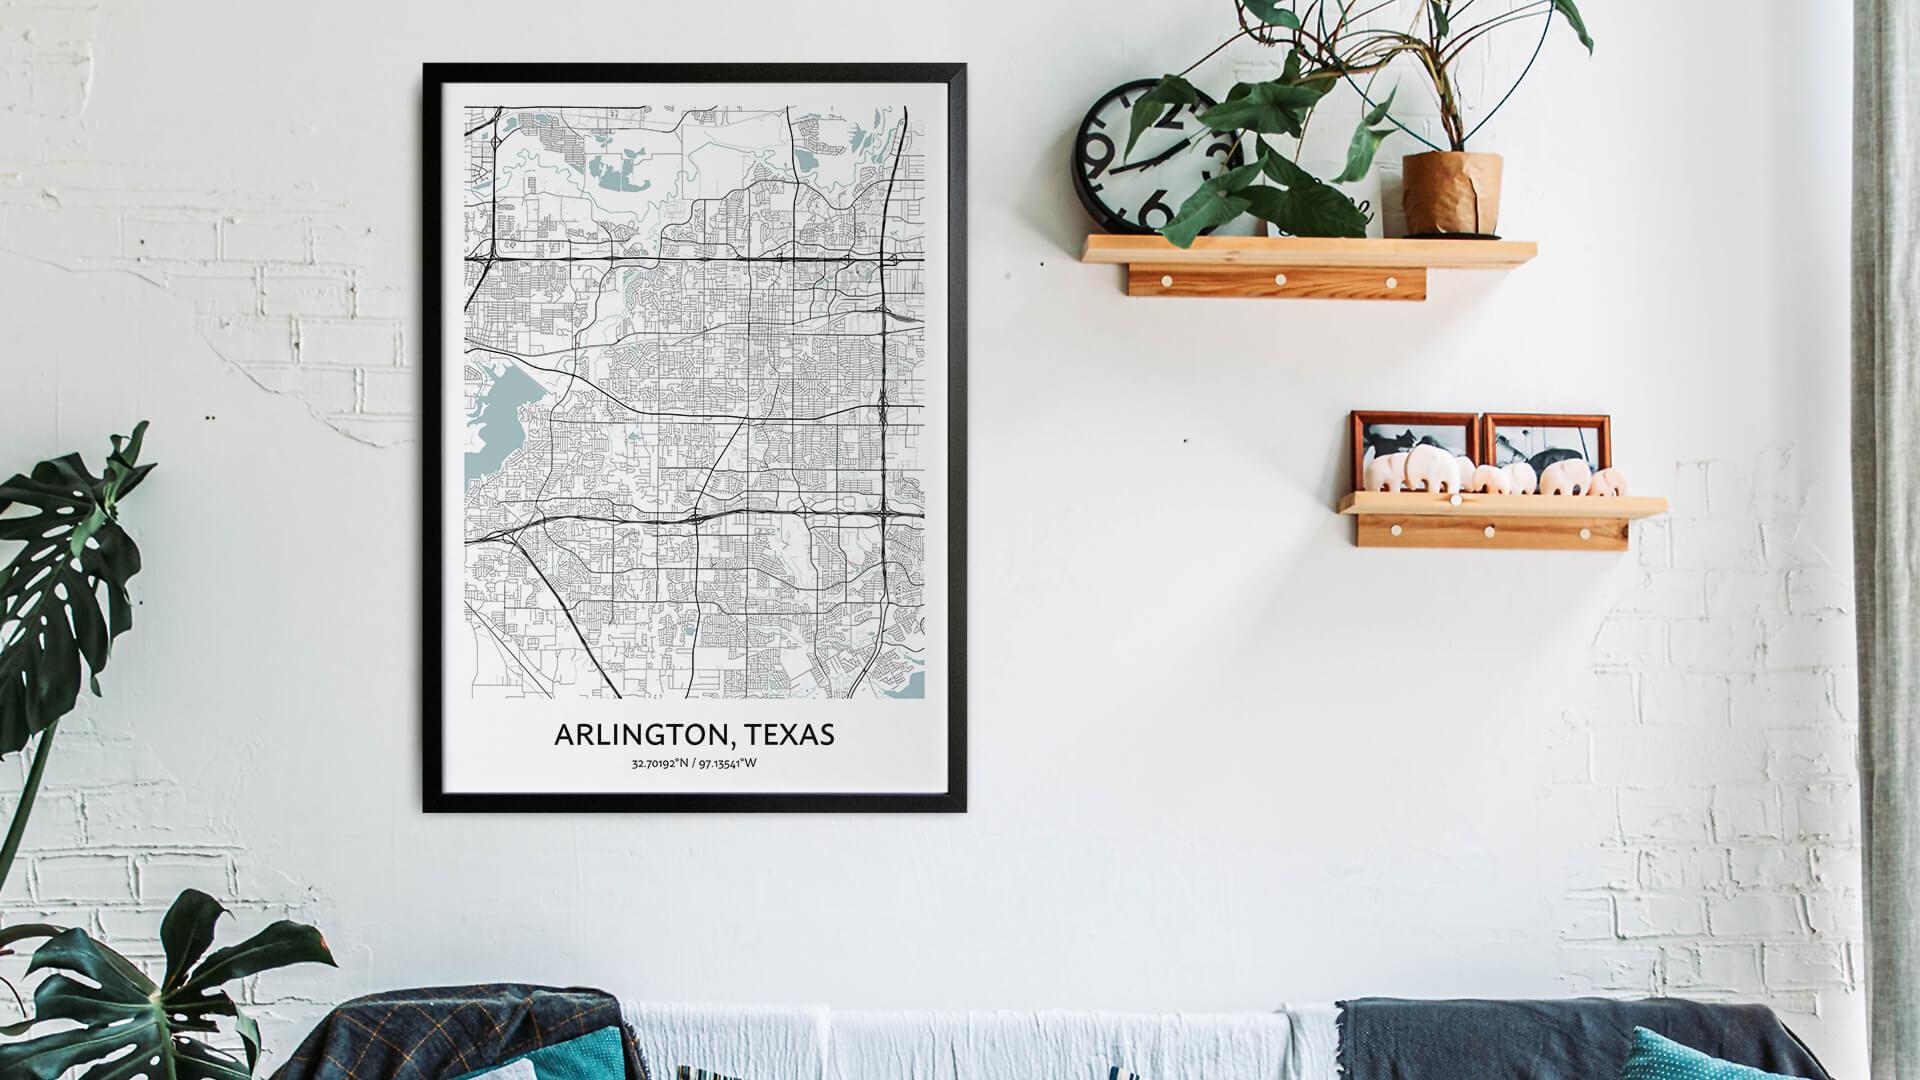 Arlington Texas map art